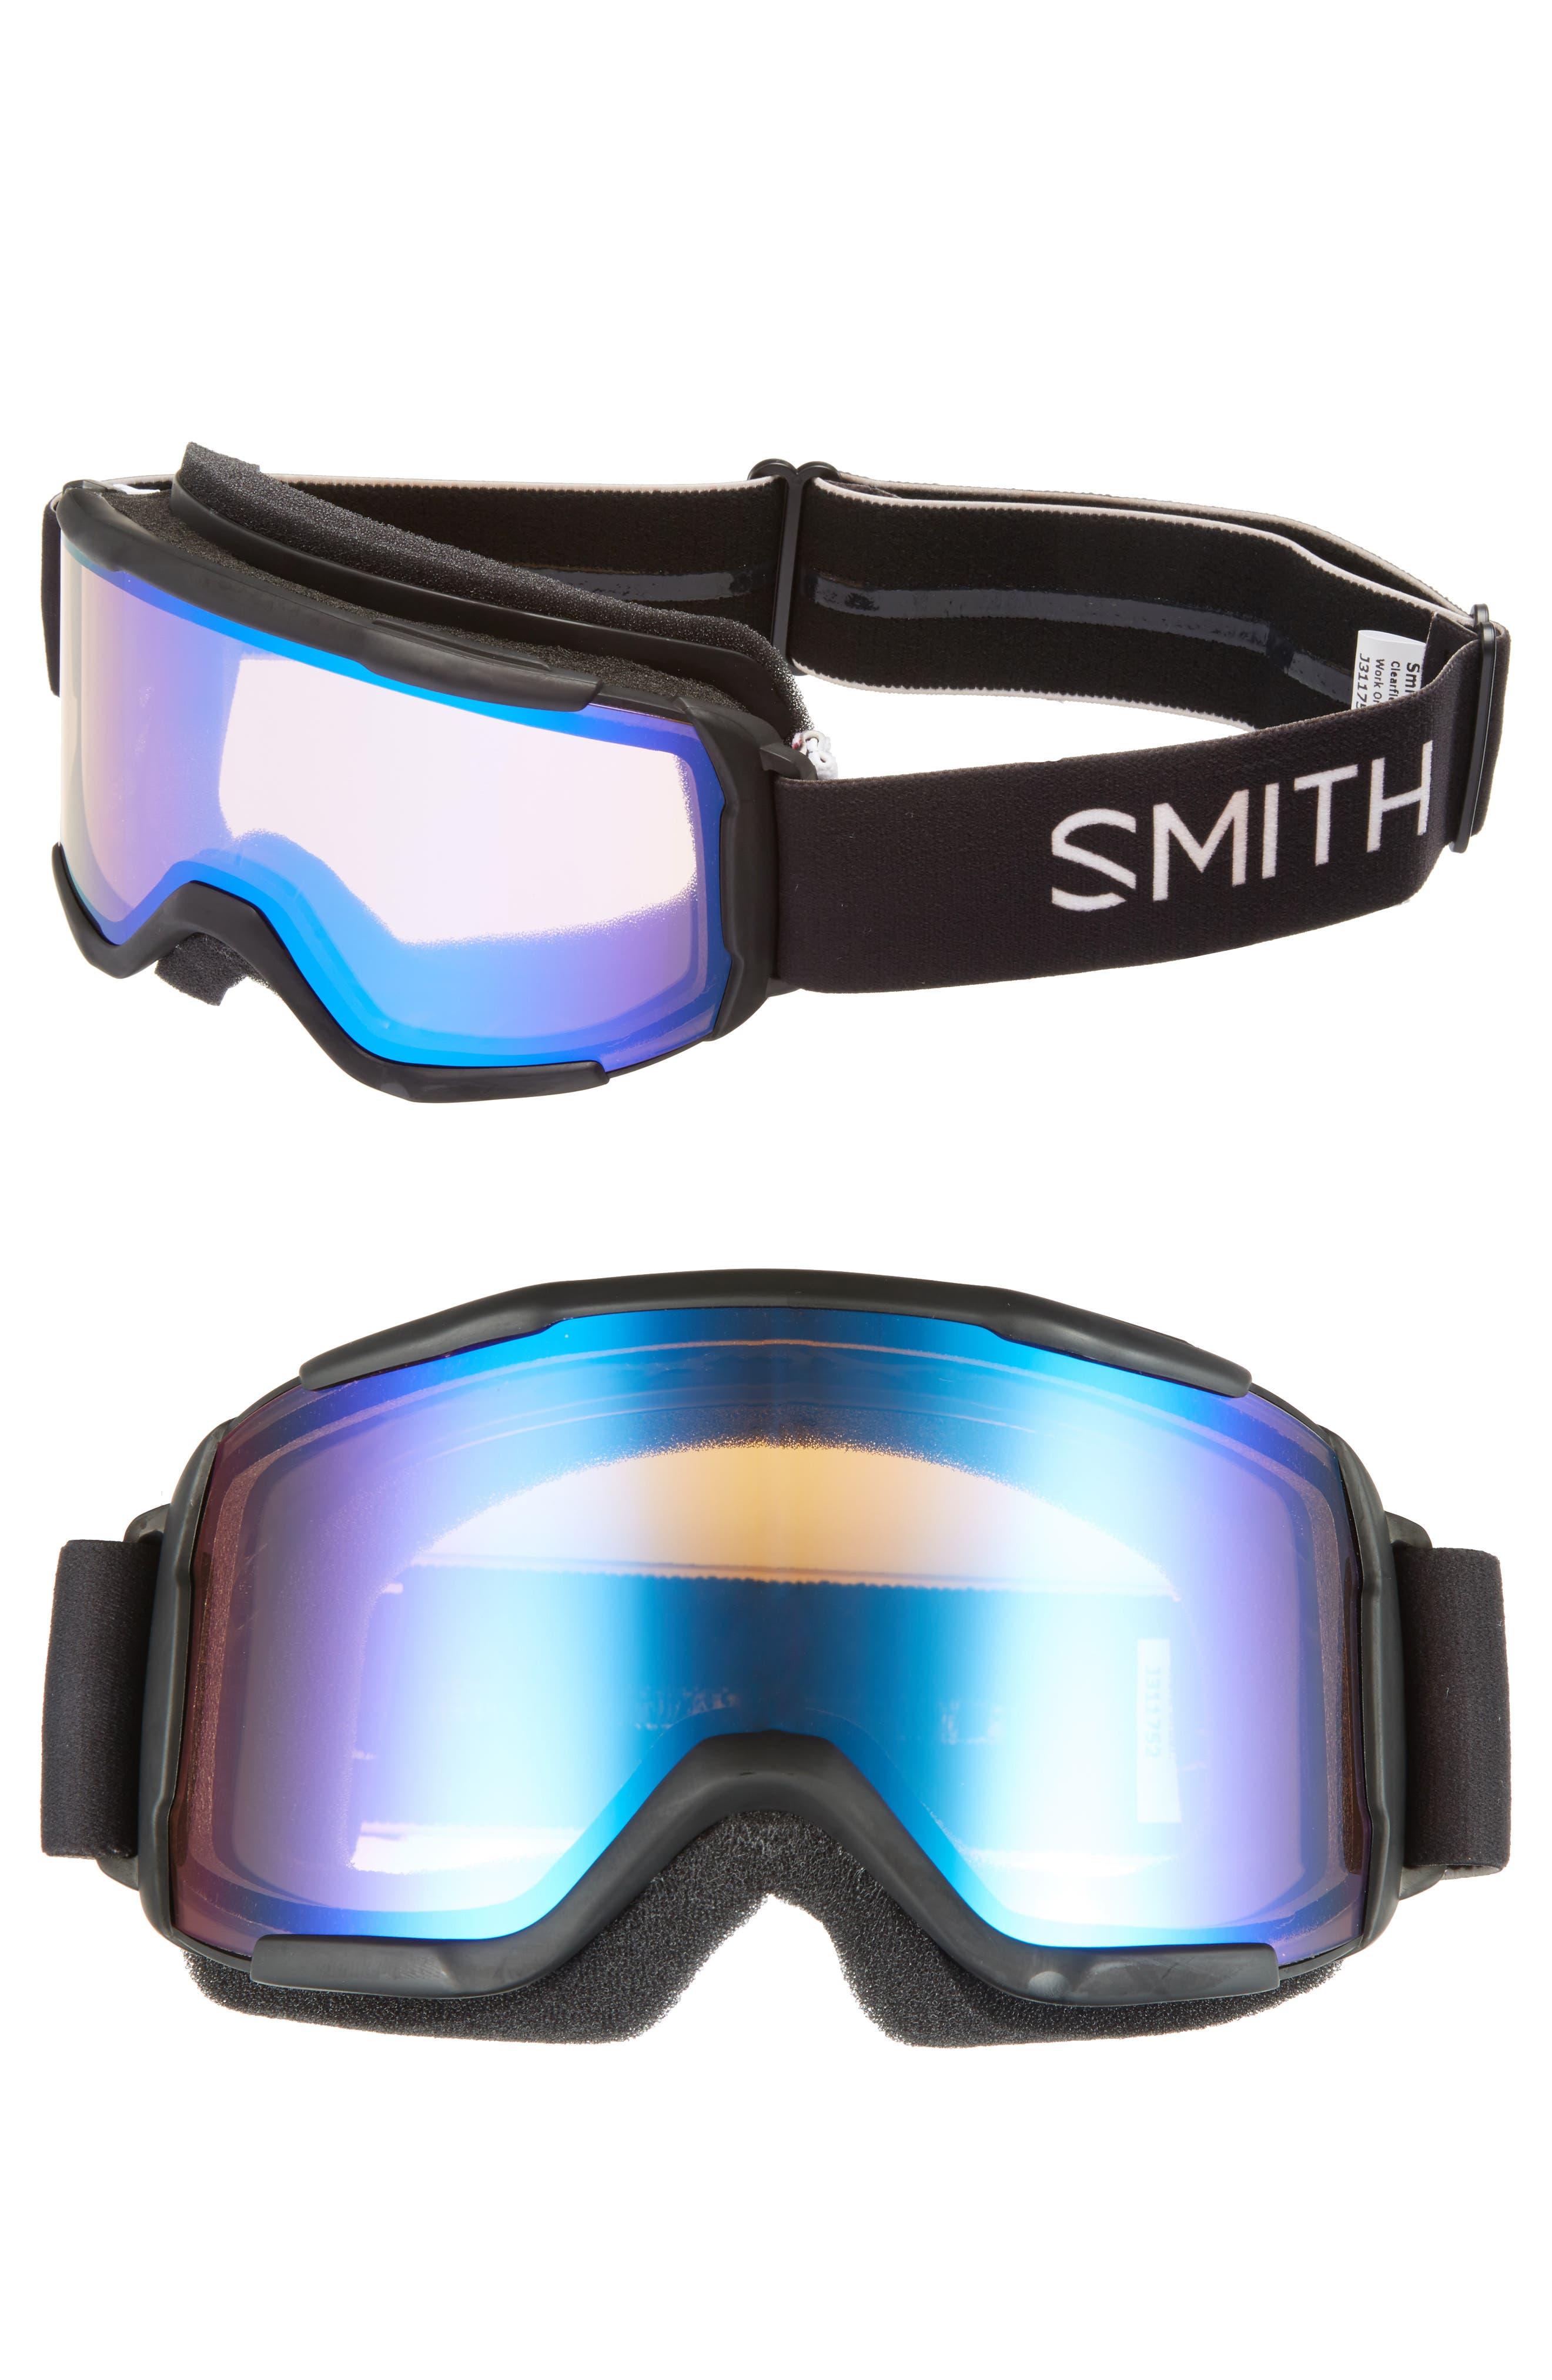 Daredevil 175mm Snow Goggles,                             Main thumbnail 1, color,                             BLACK/ MIRROR